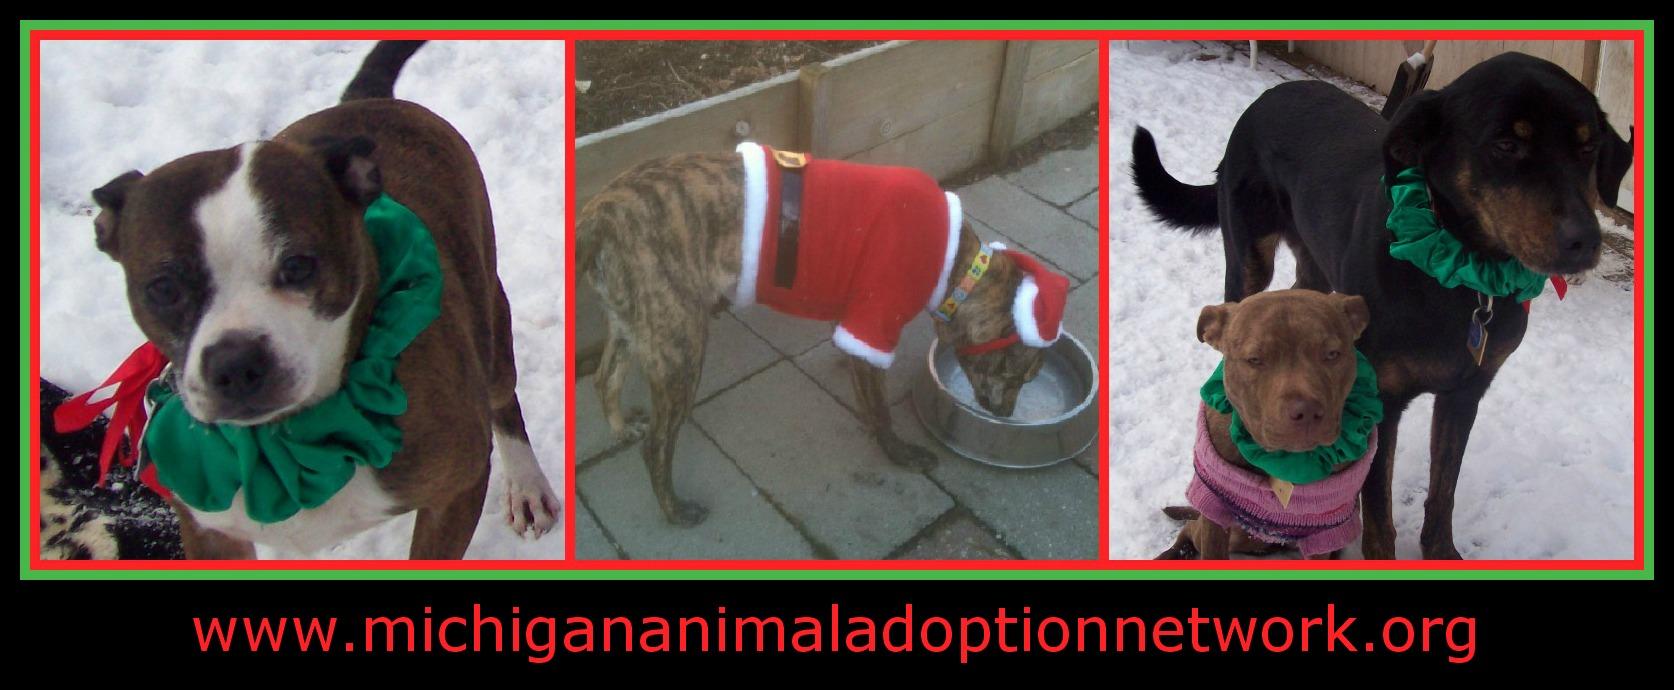 December 26 PicMonkey Collage